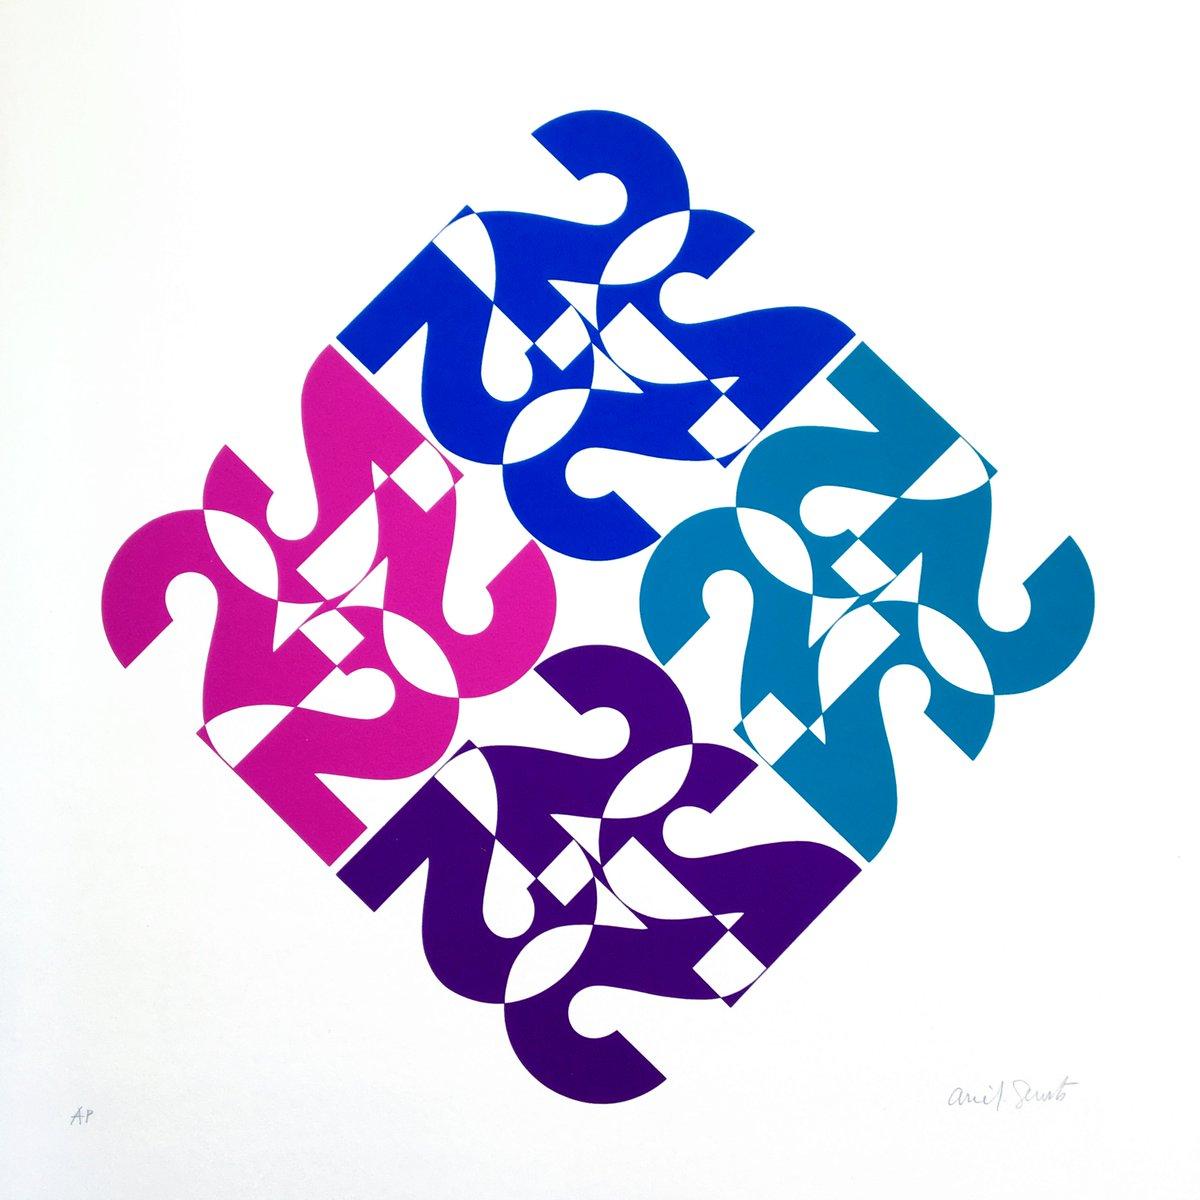 Calendario 1976.Letterform Archive On Twitter Arie J Geurts Calendario